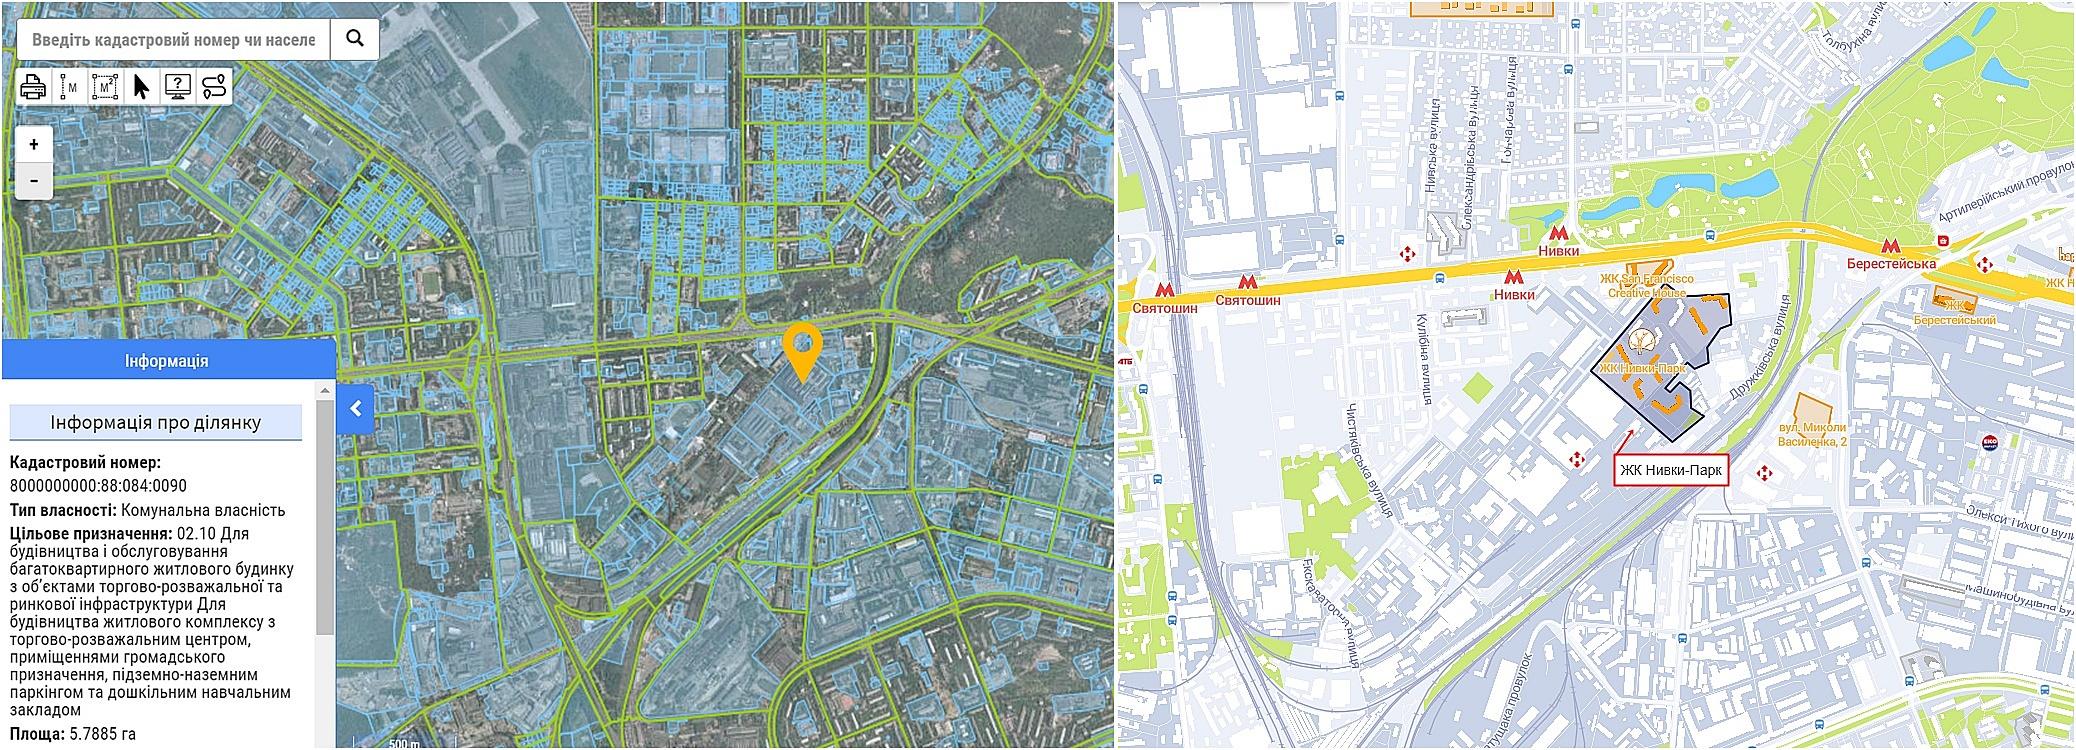 ЖК Нивки-Парк данные кадастра и на карте